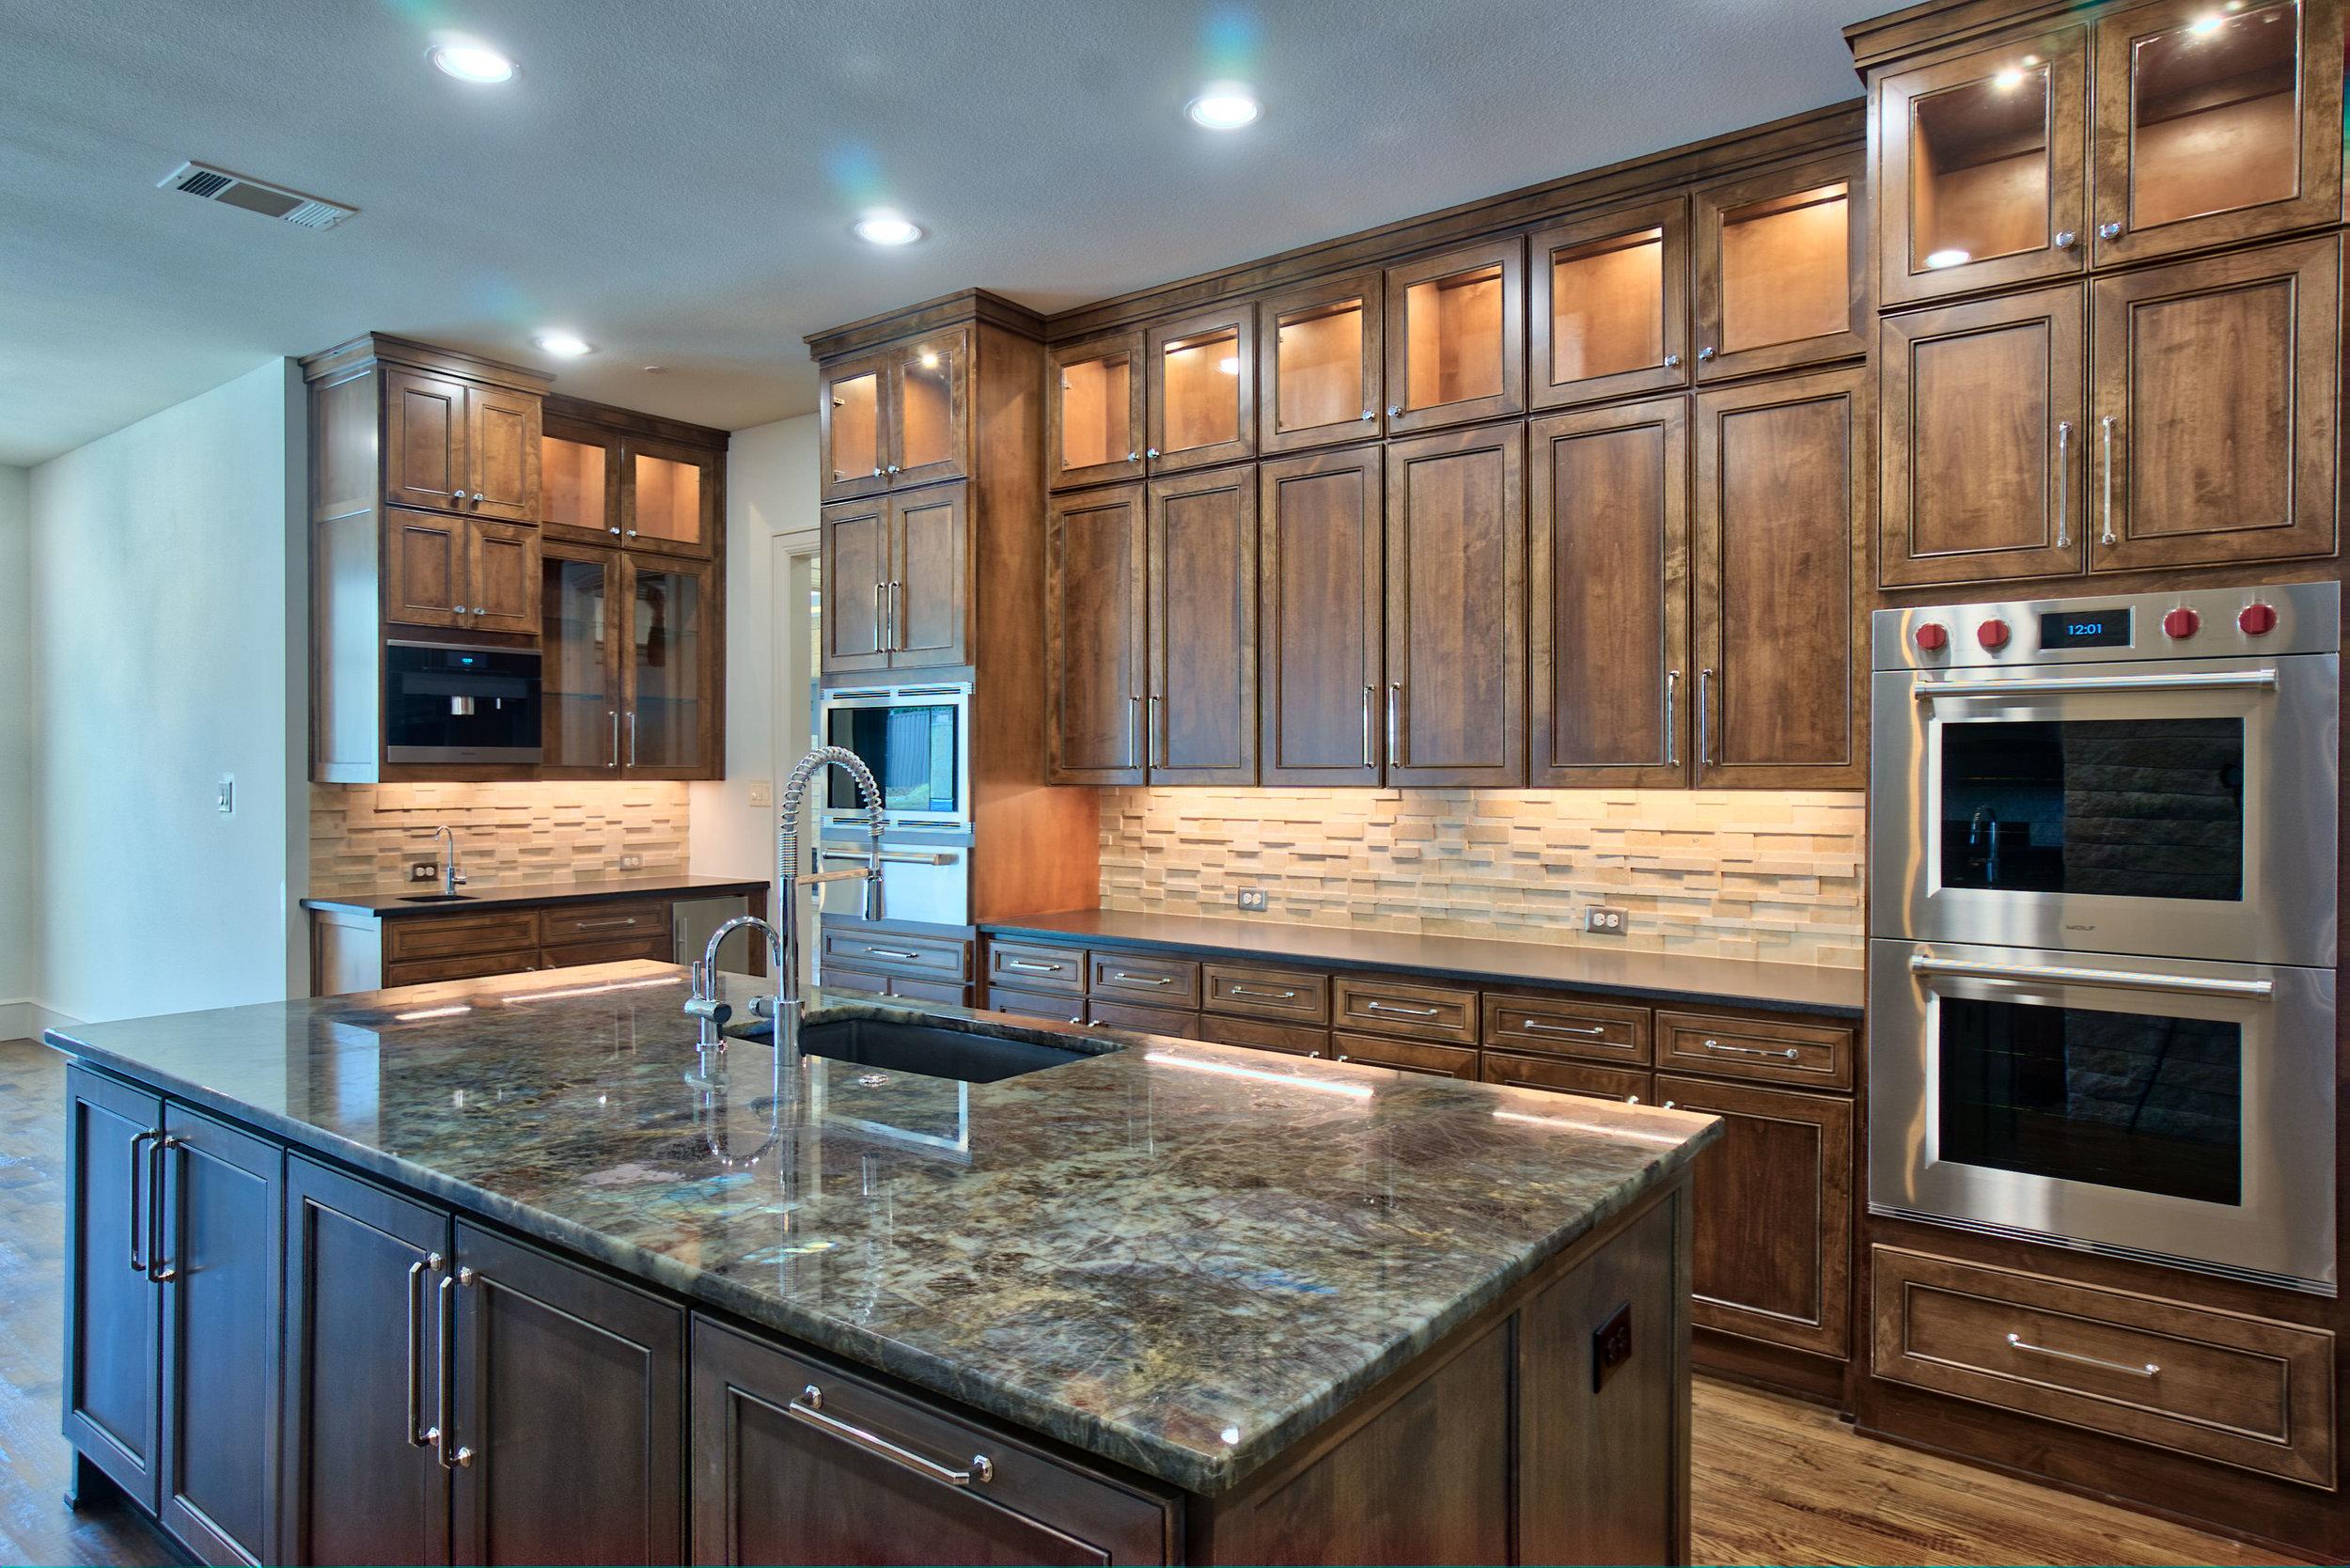 14 kitchen 7.jpeg